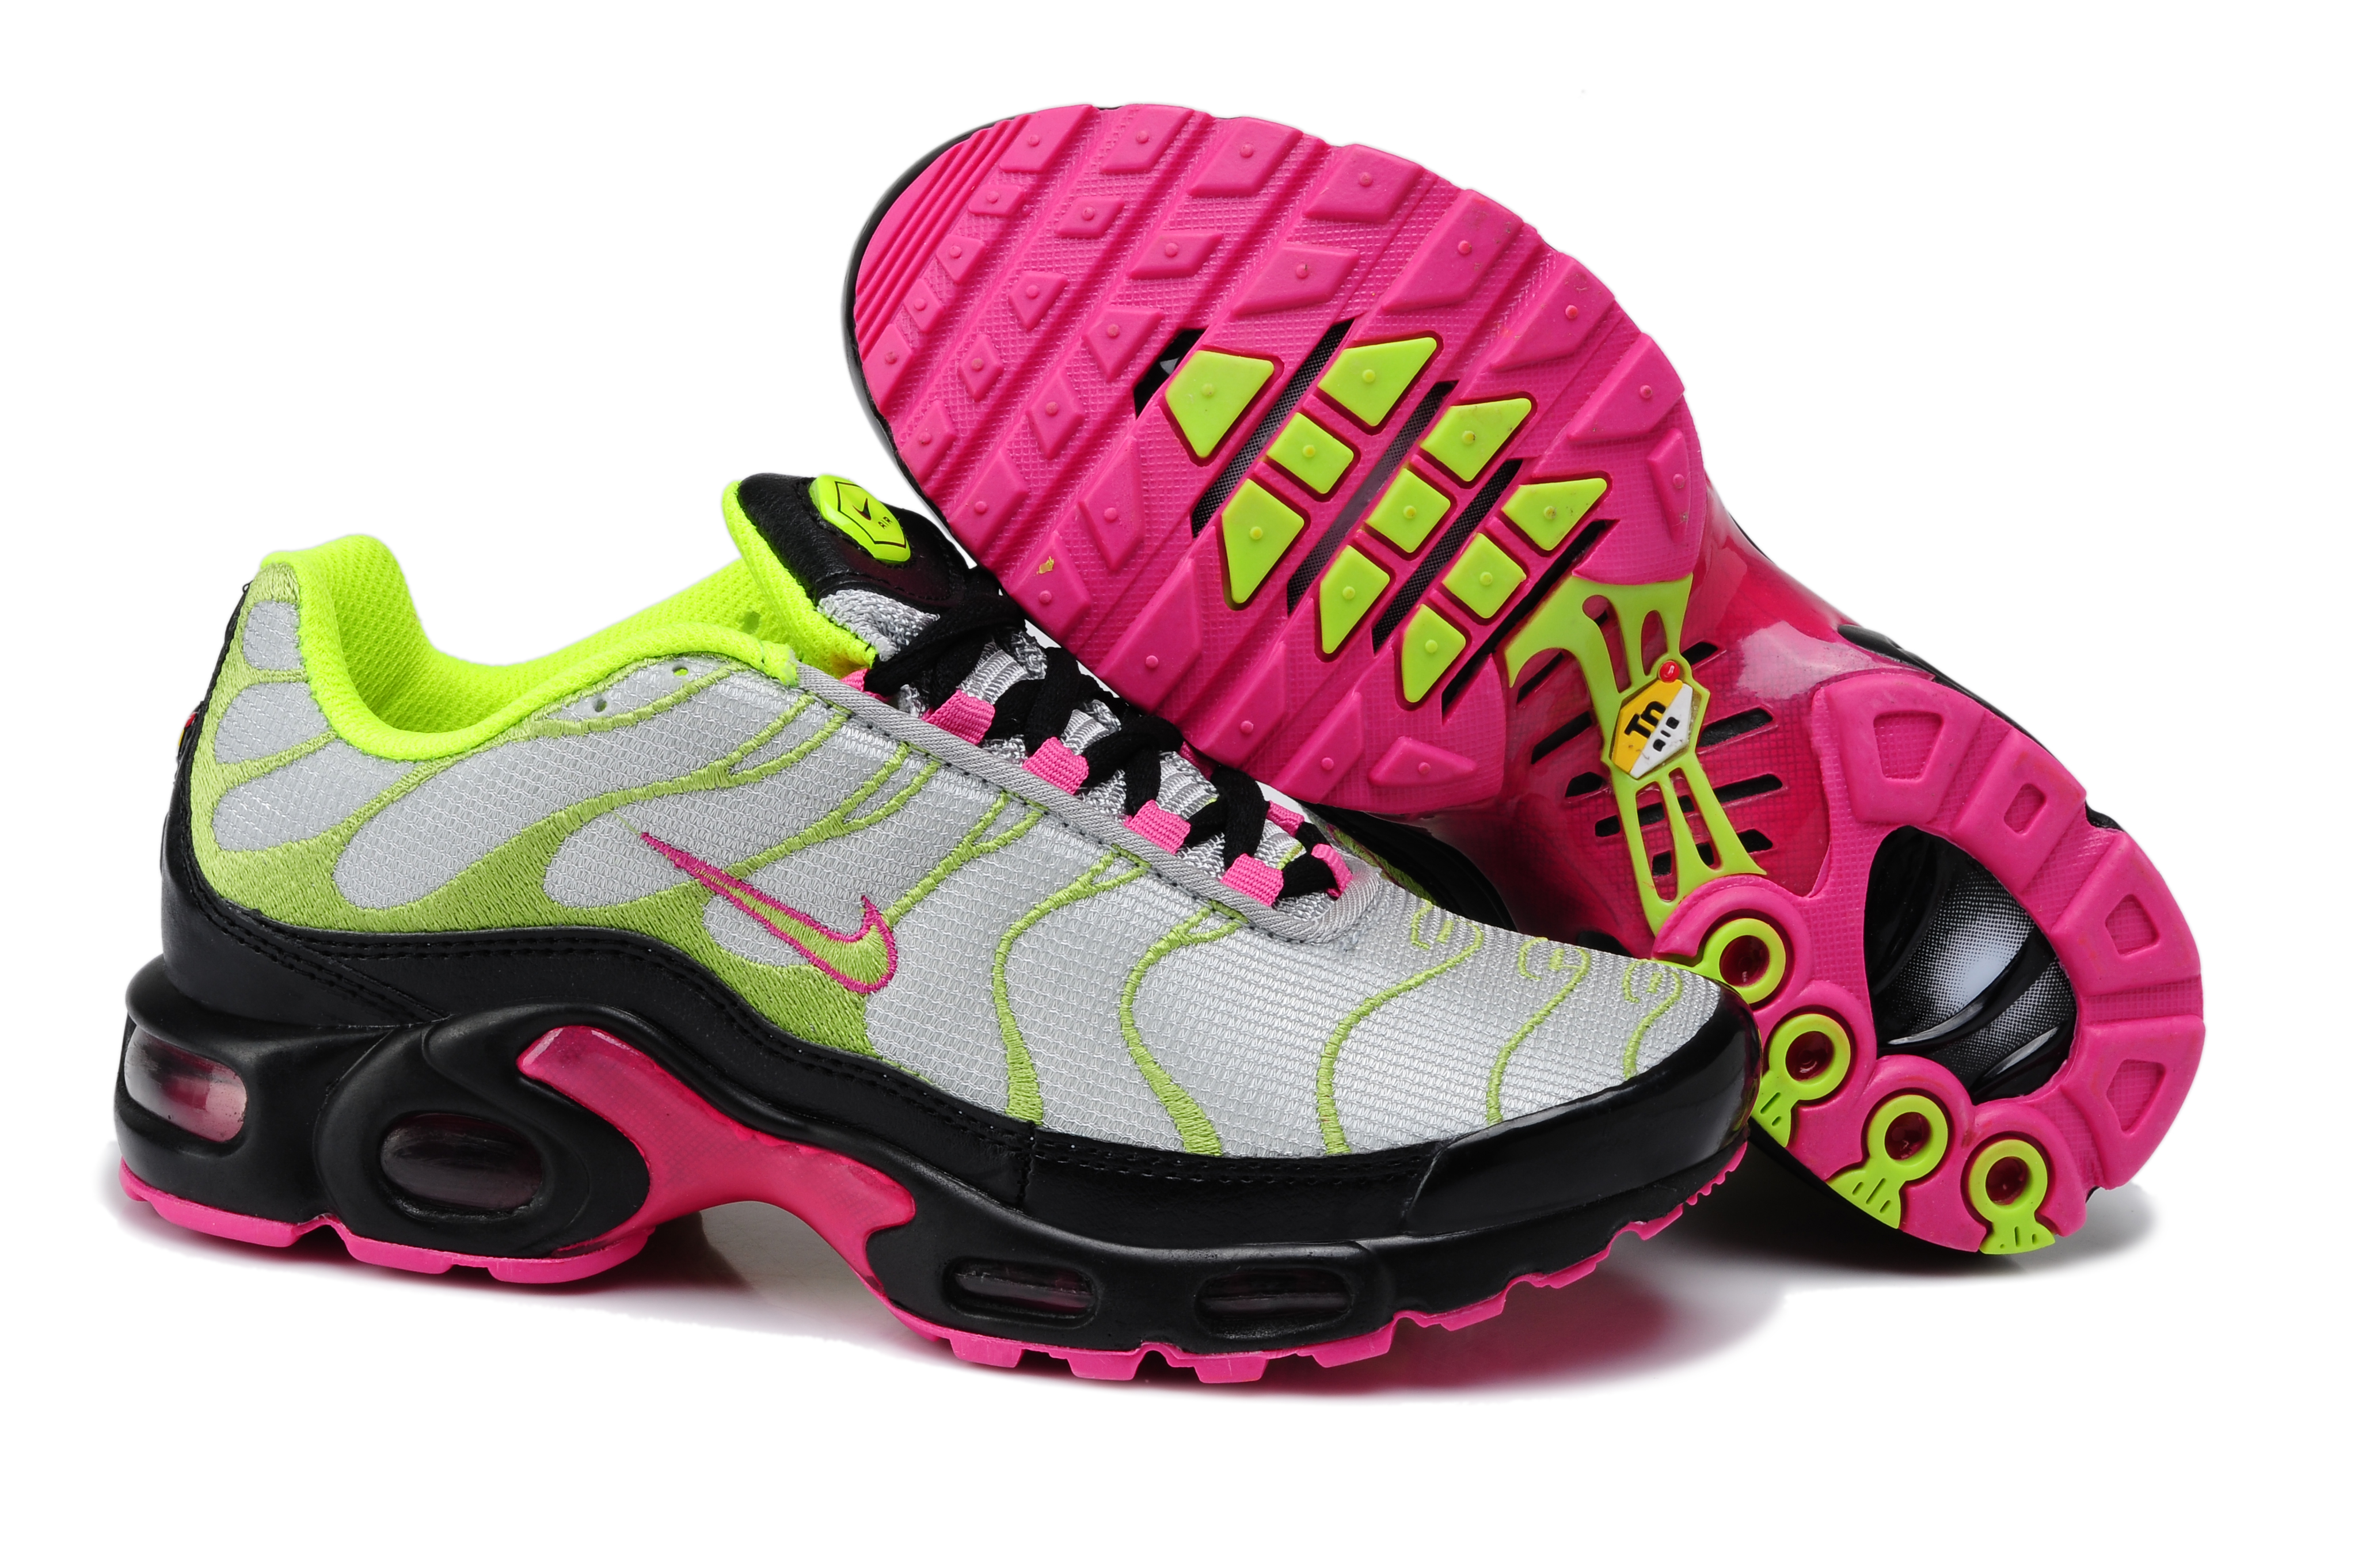 finest selection 6590c 02426 Nike-Air-Max-2014-Femme-chaussure-nike-air-